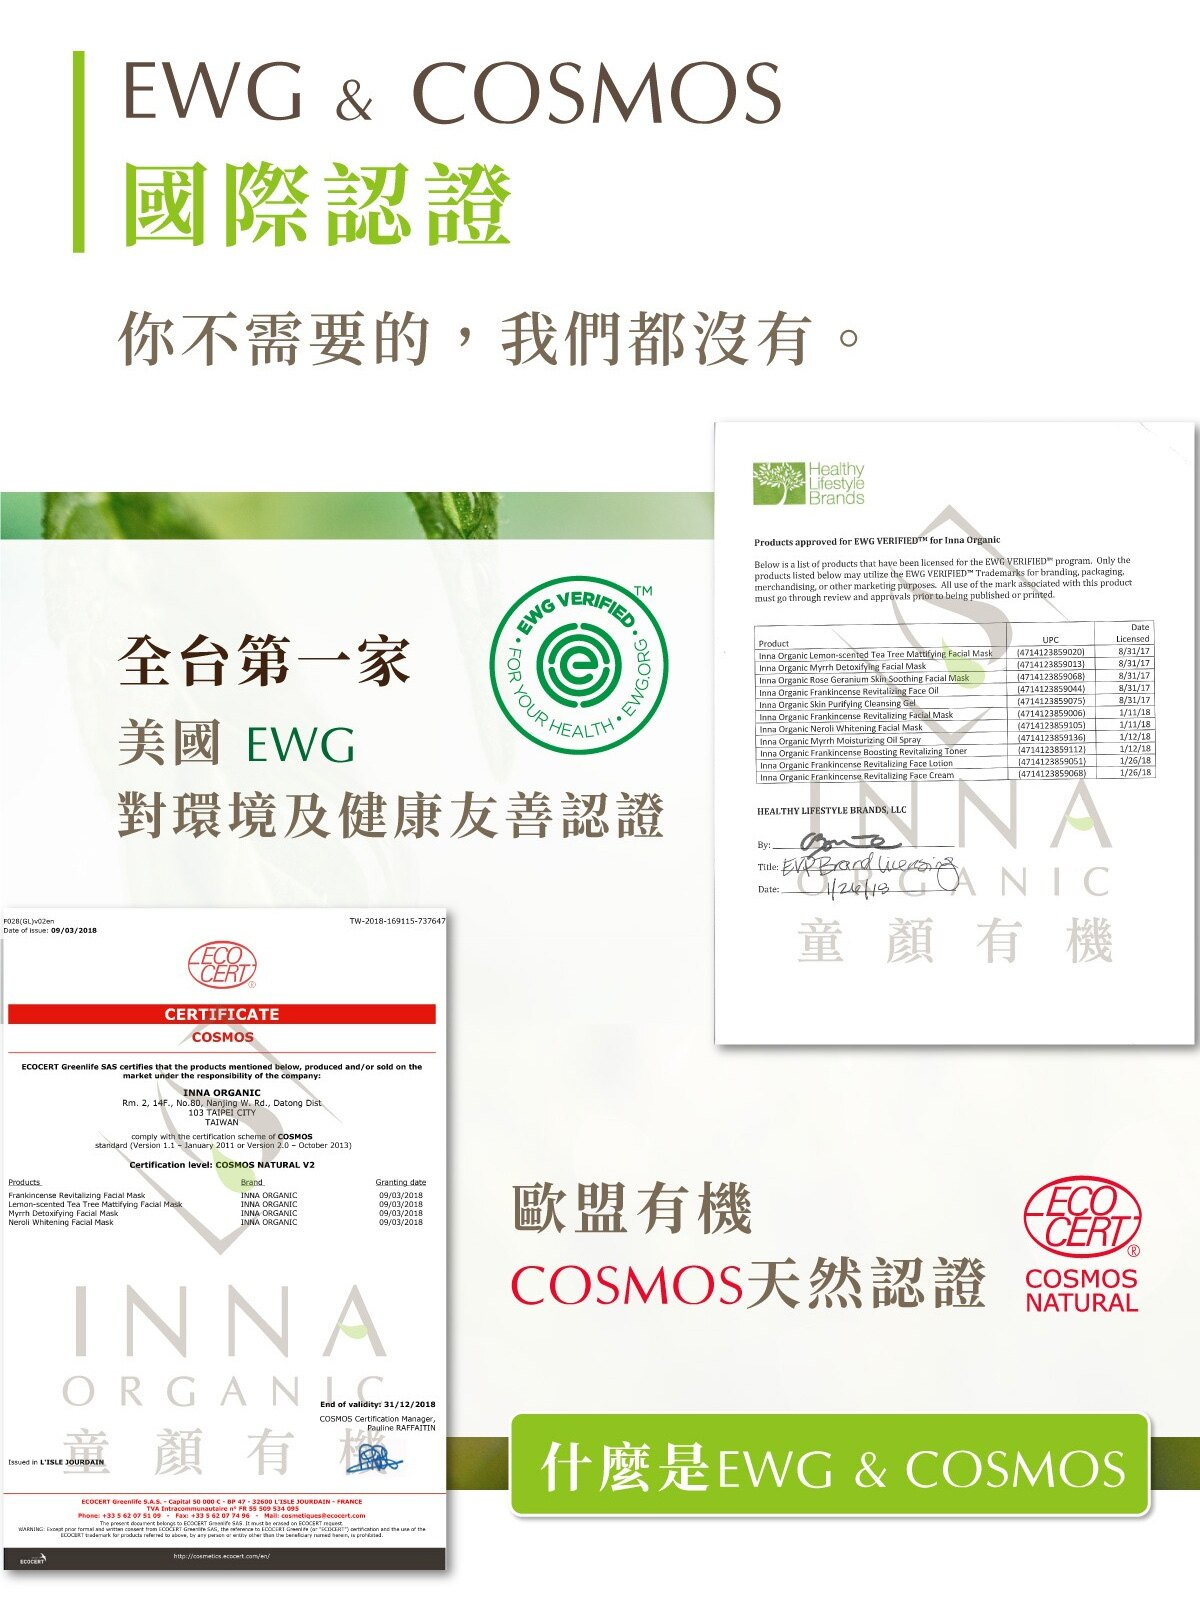 MIT👍滿額贈♥️【Inna Organic 童顏有機】沒藥水潤淨化隱形面膜 (1片) 9